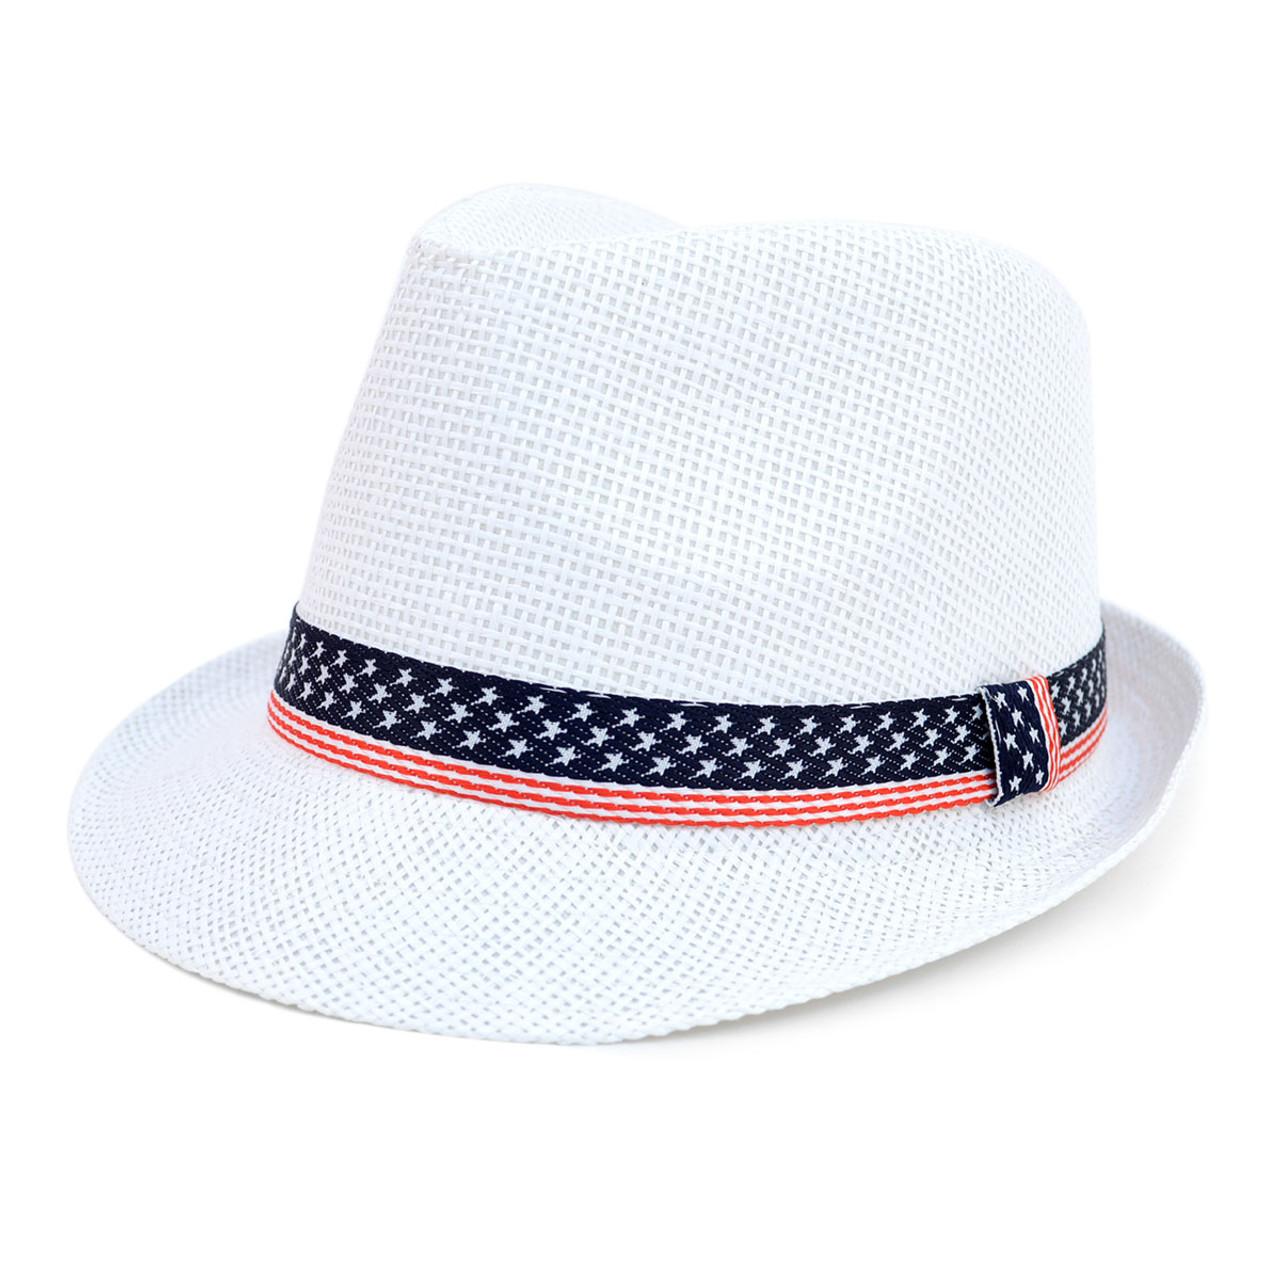 35082e068e8 Spring/Summer White Fedora Hat with Stars & Stripes American Flag ...